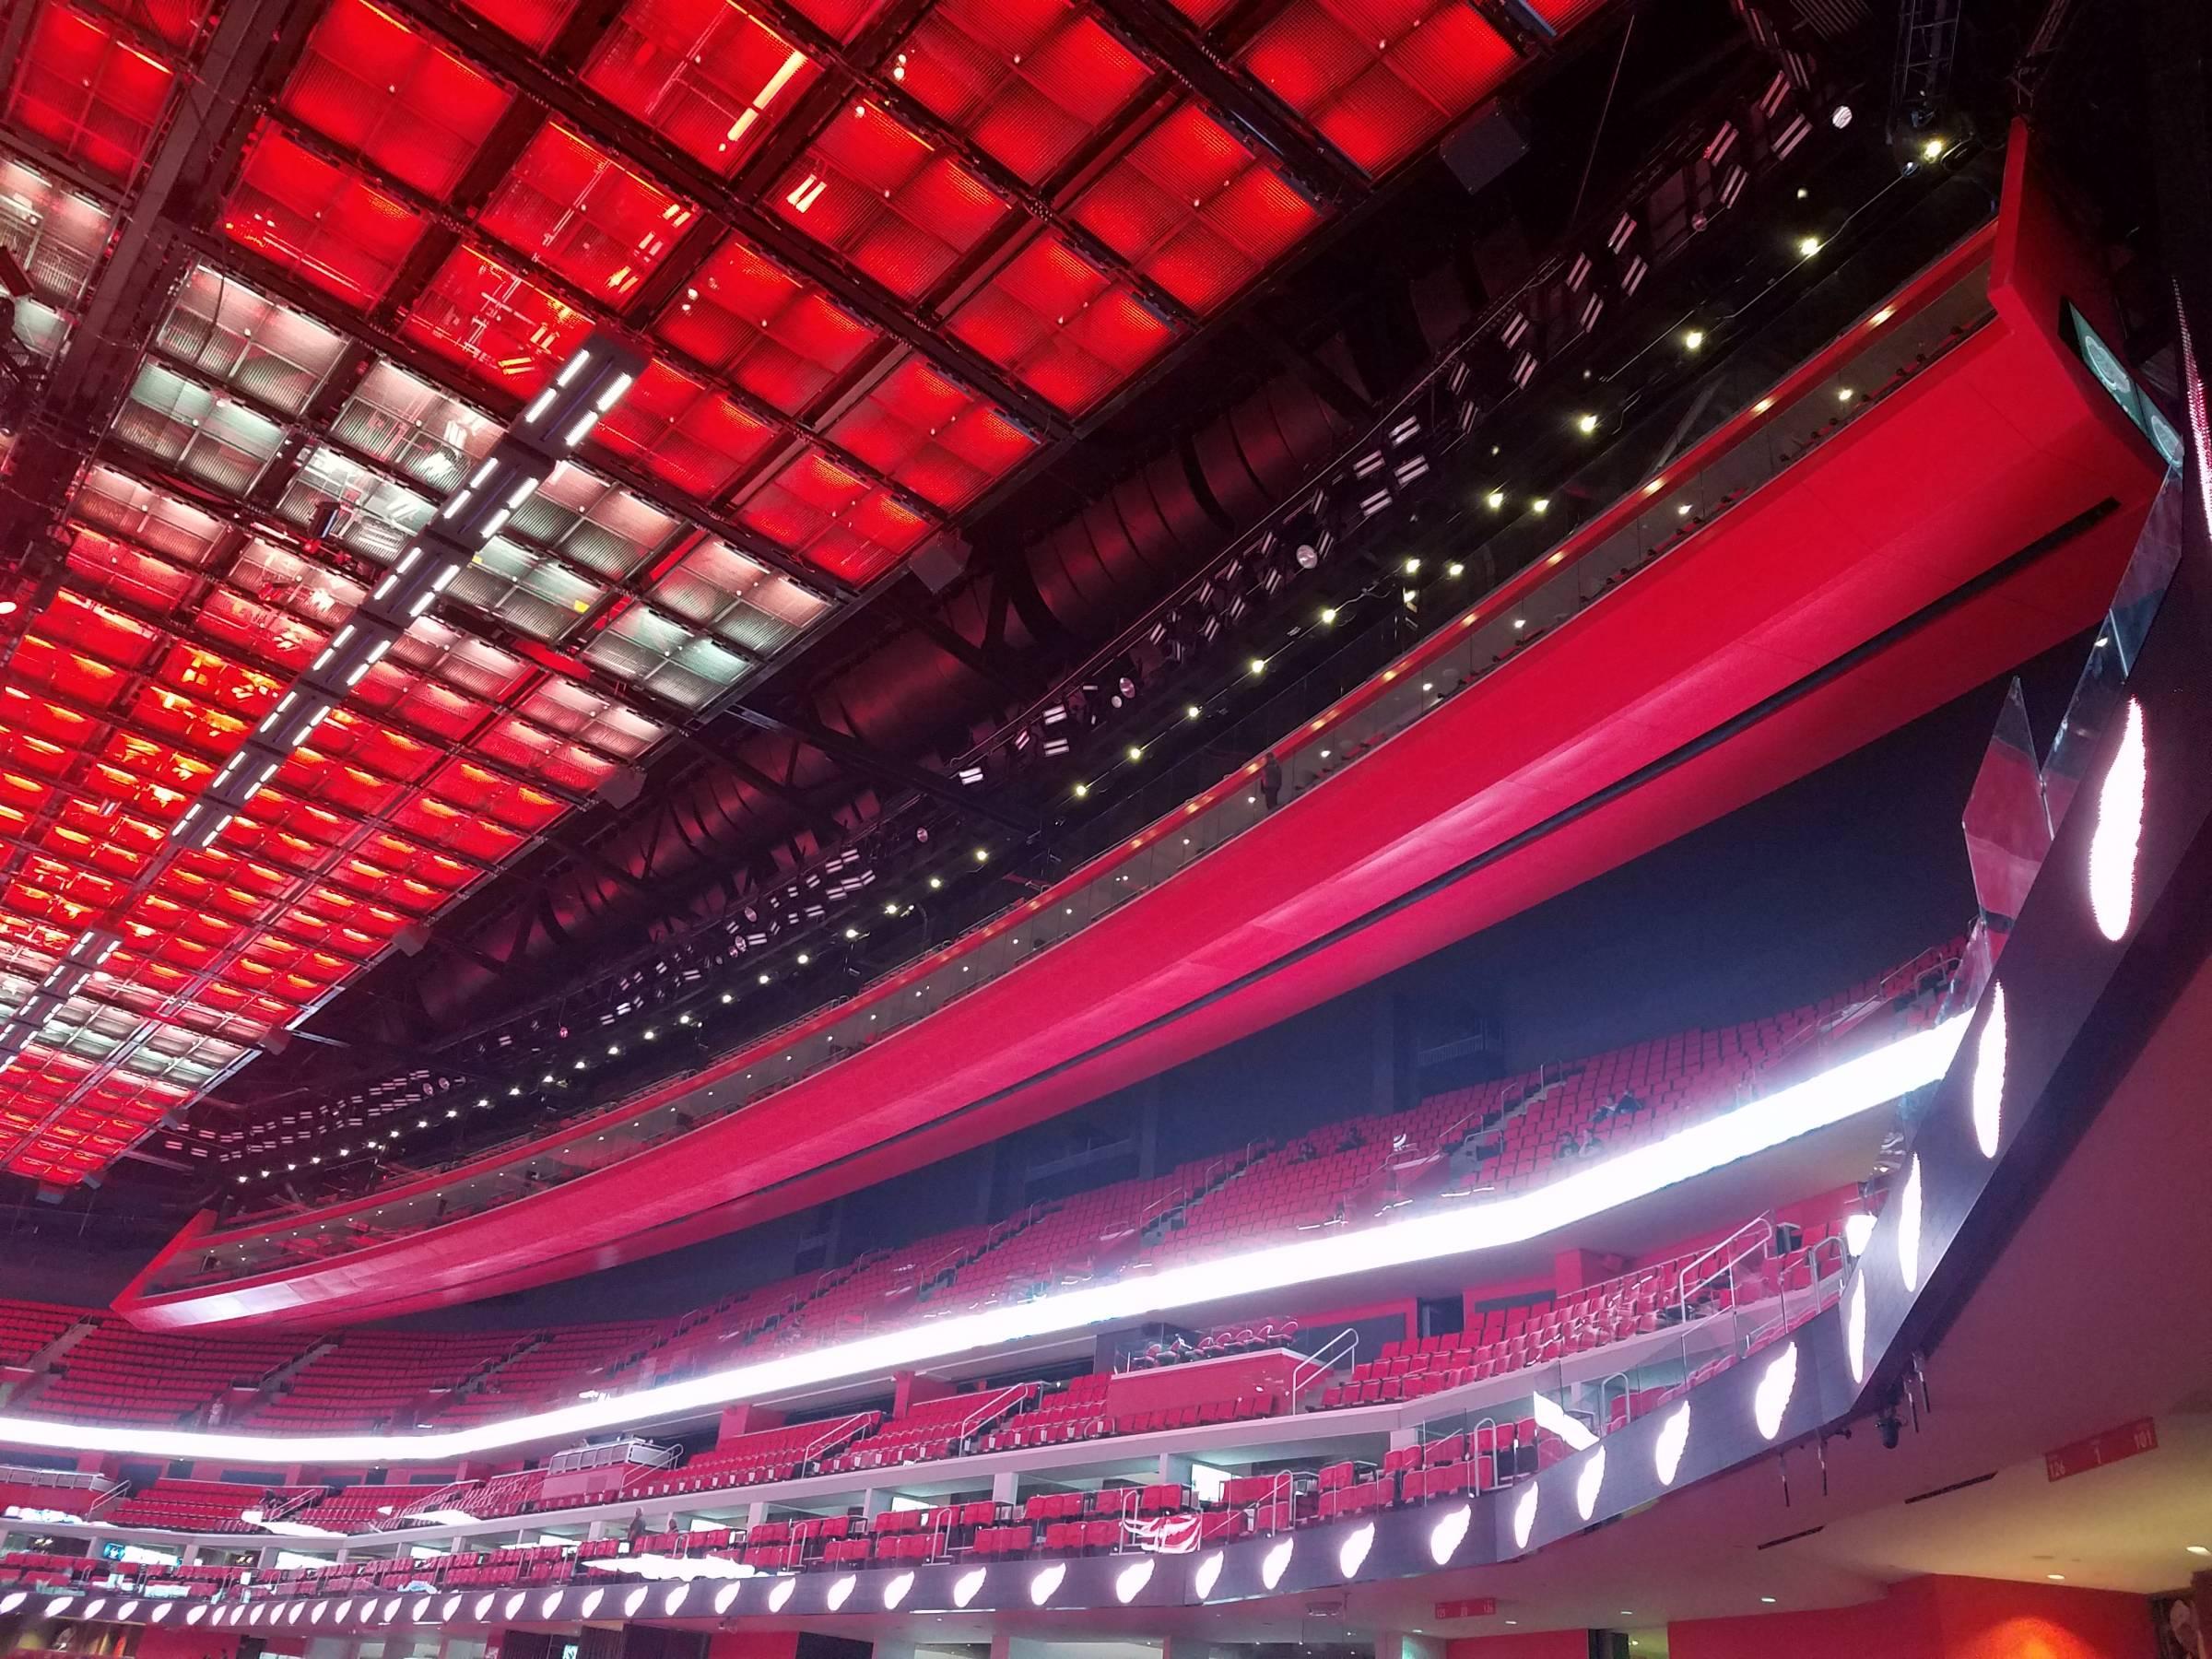 Little Caesars Arena Lower Gondola - Detroit Red Wings - RateYourSeats.com